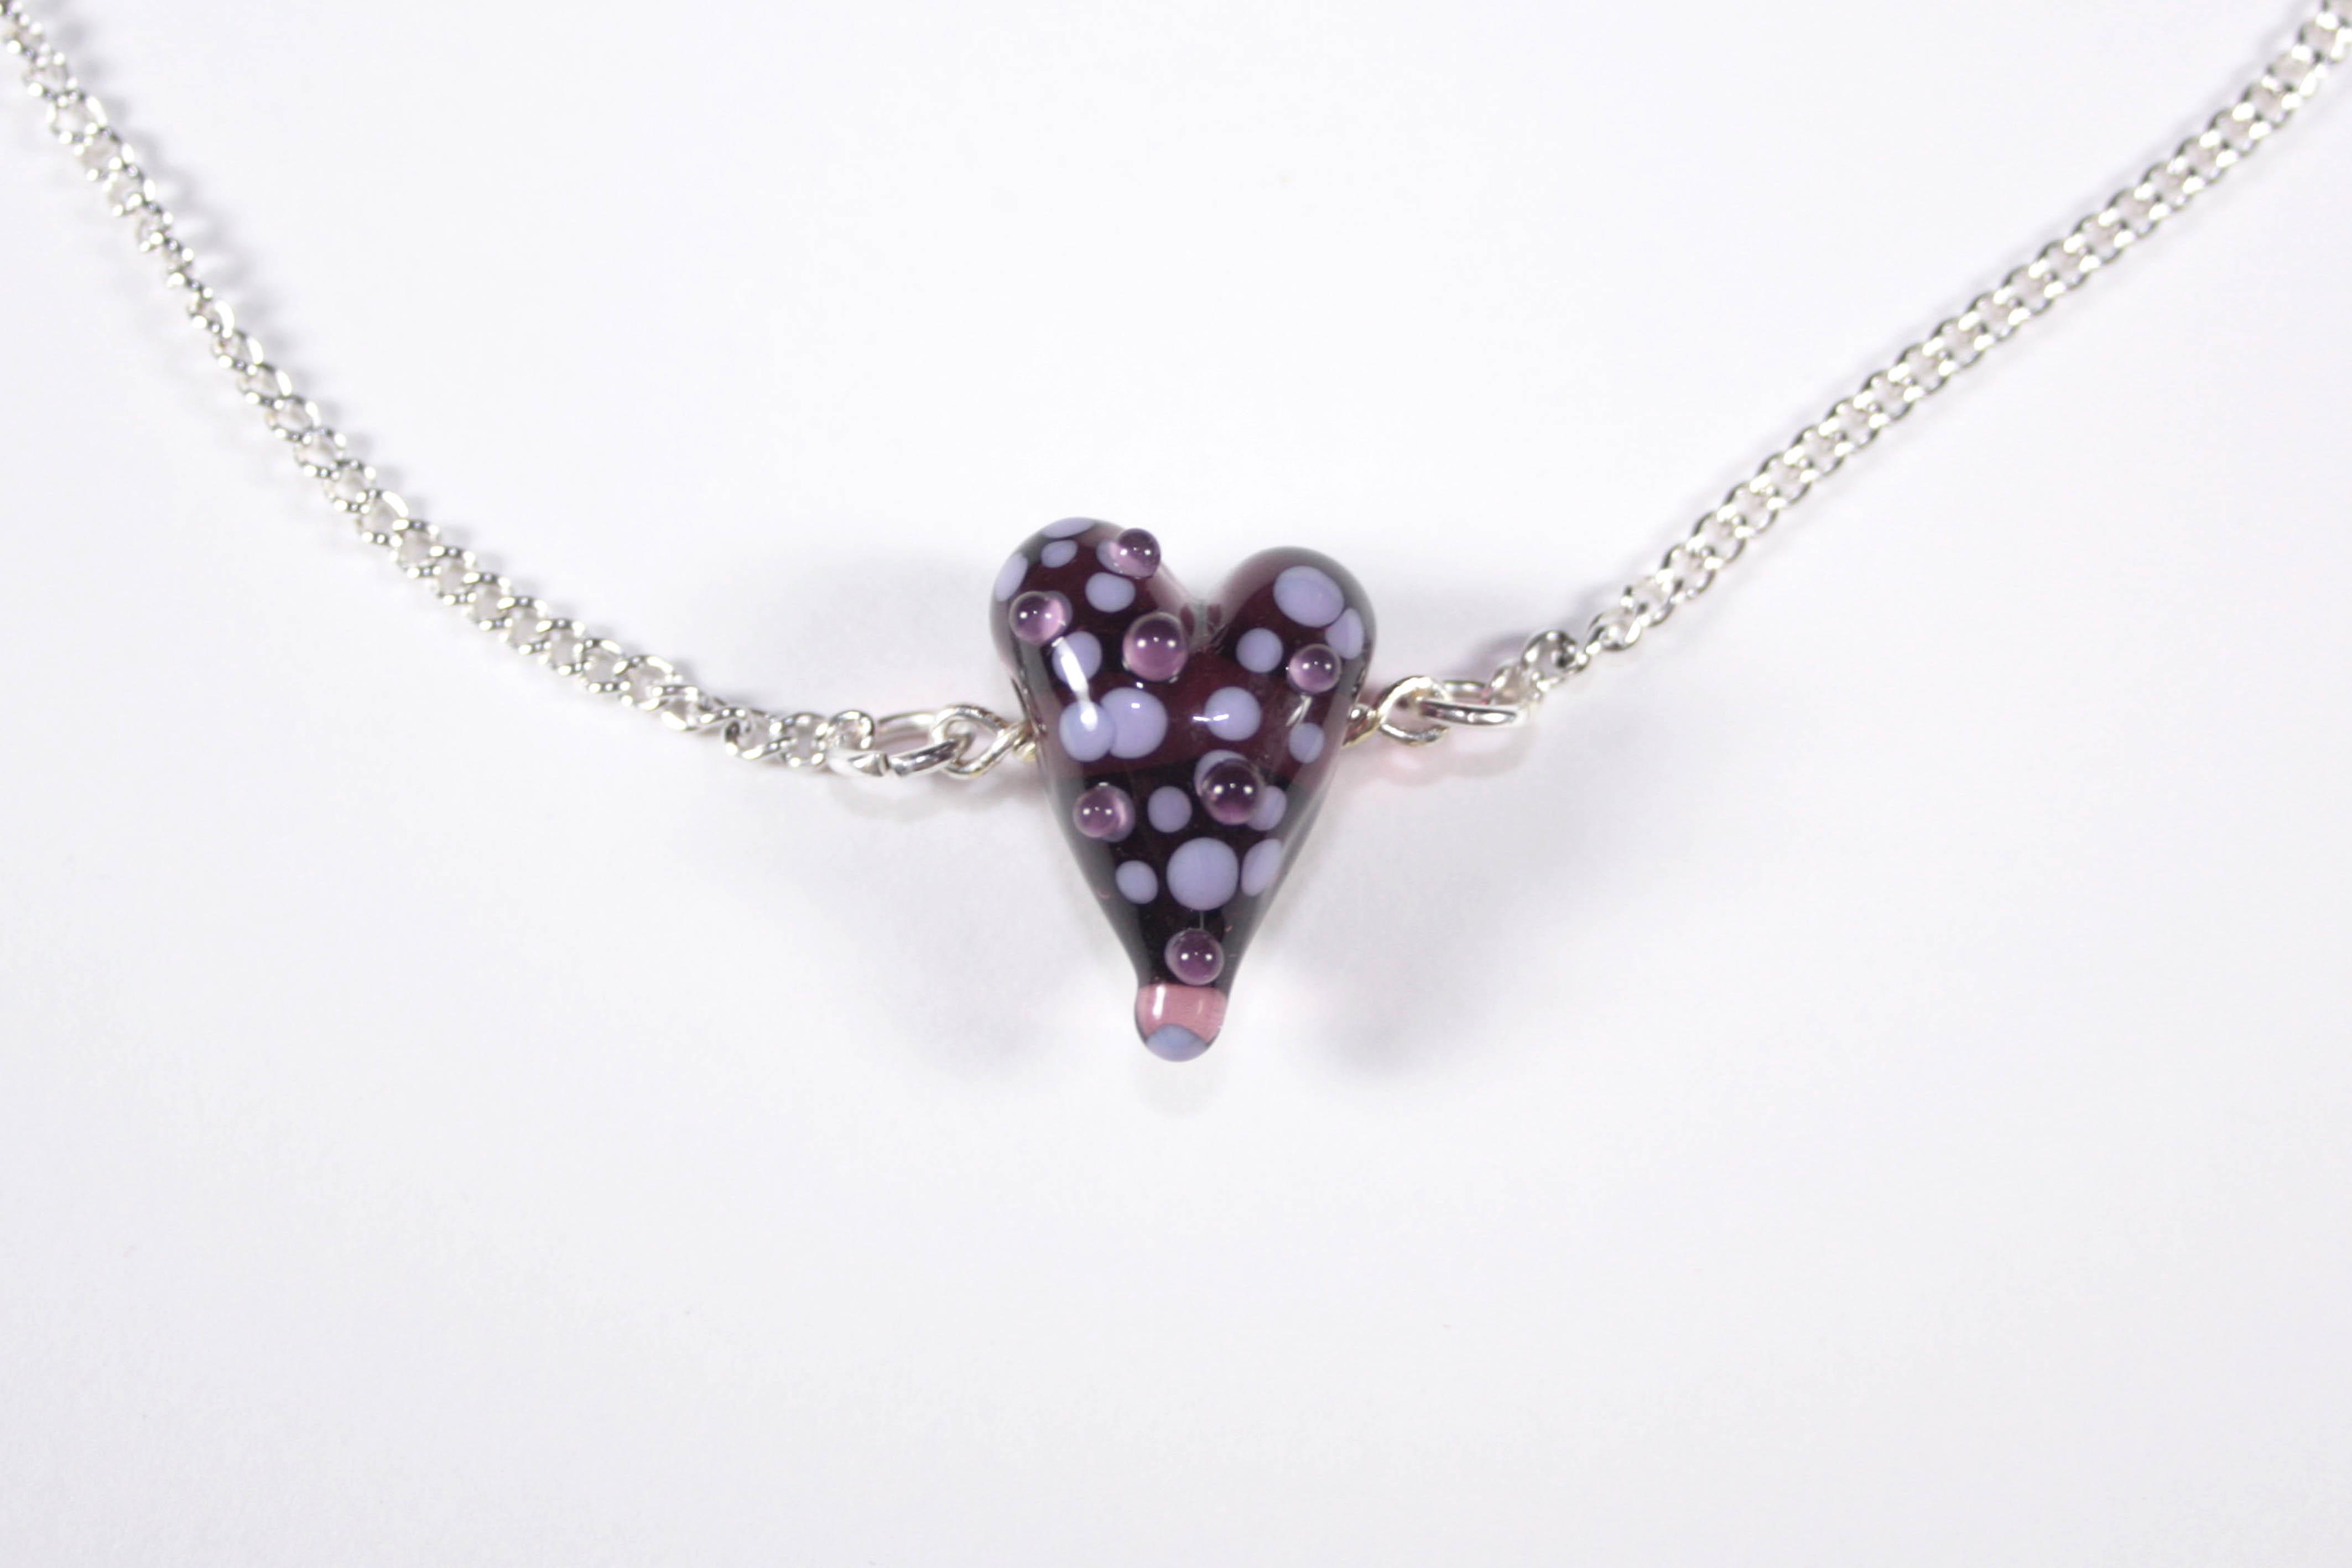 Purpleheart-3.2.14